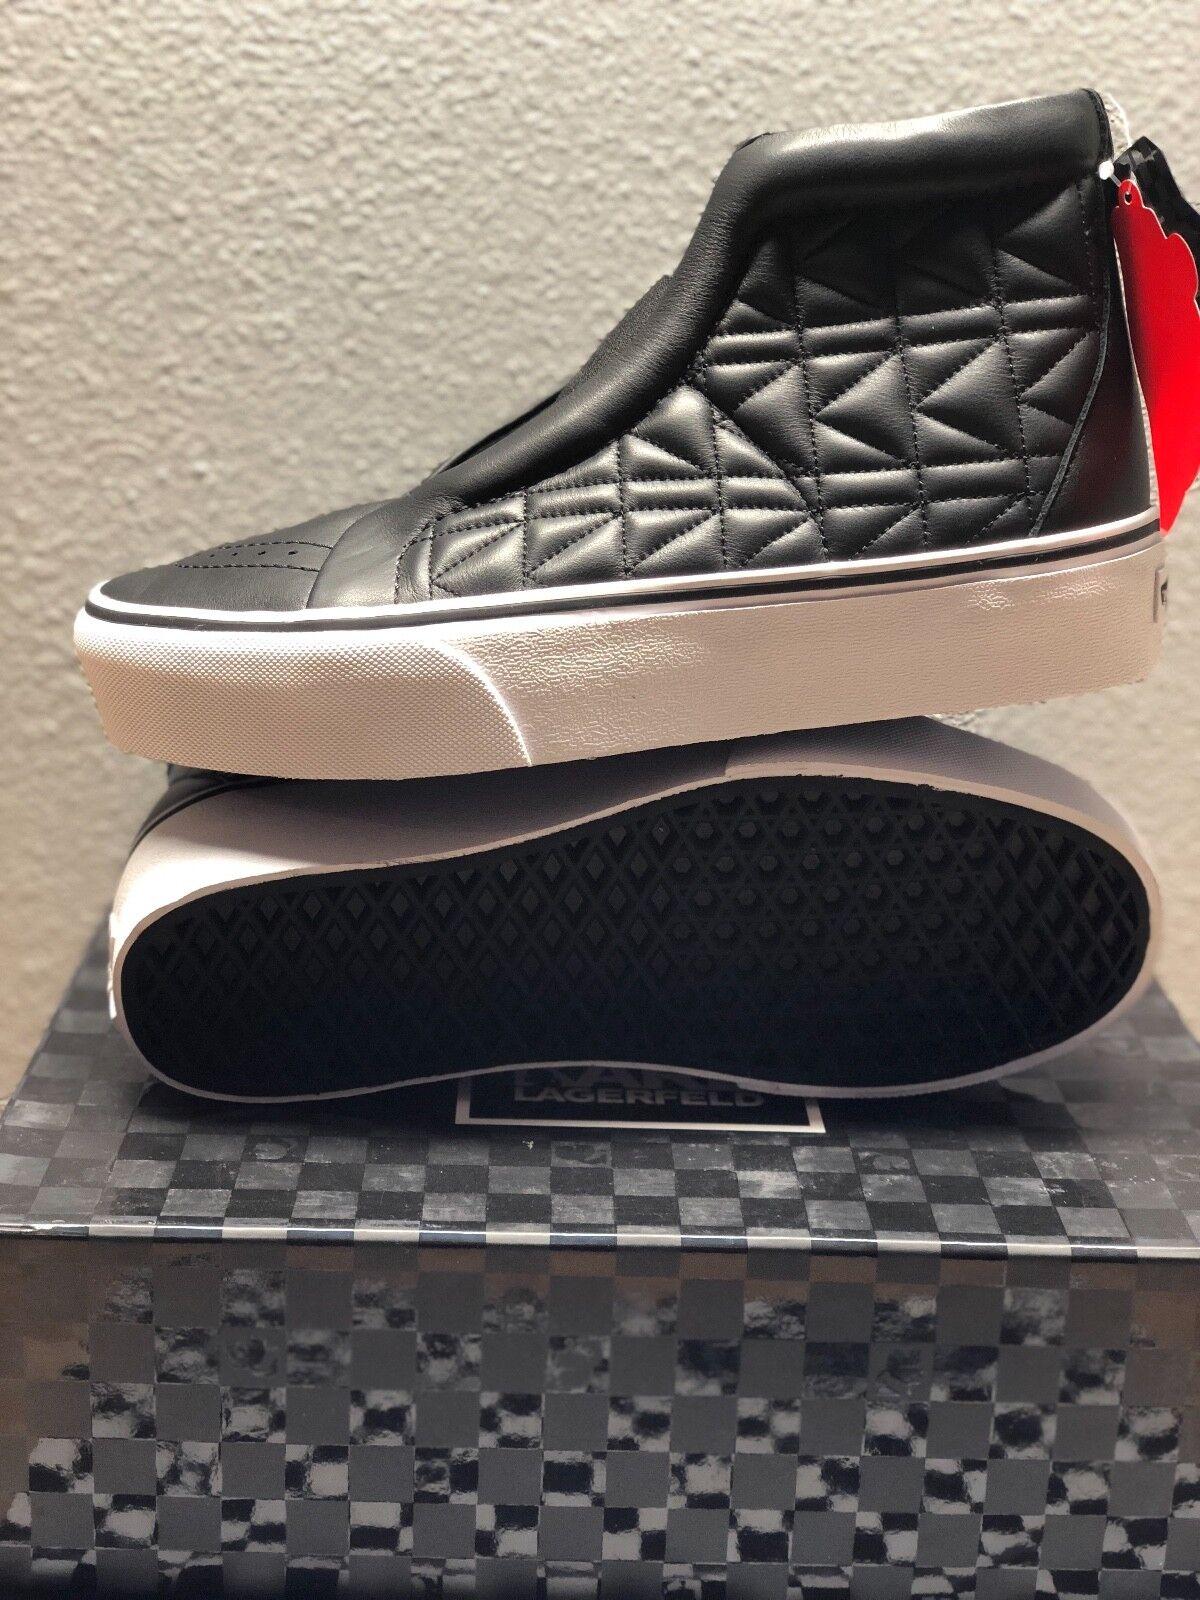 Nuevas Vans X Karl Lagerfeld SK8-HI Salón Plataforma US Hombre EE. UU. Mujer